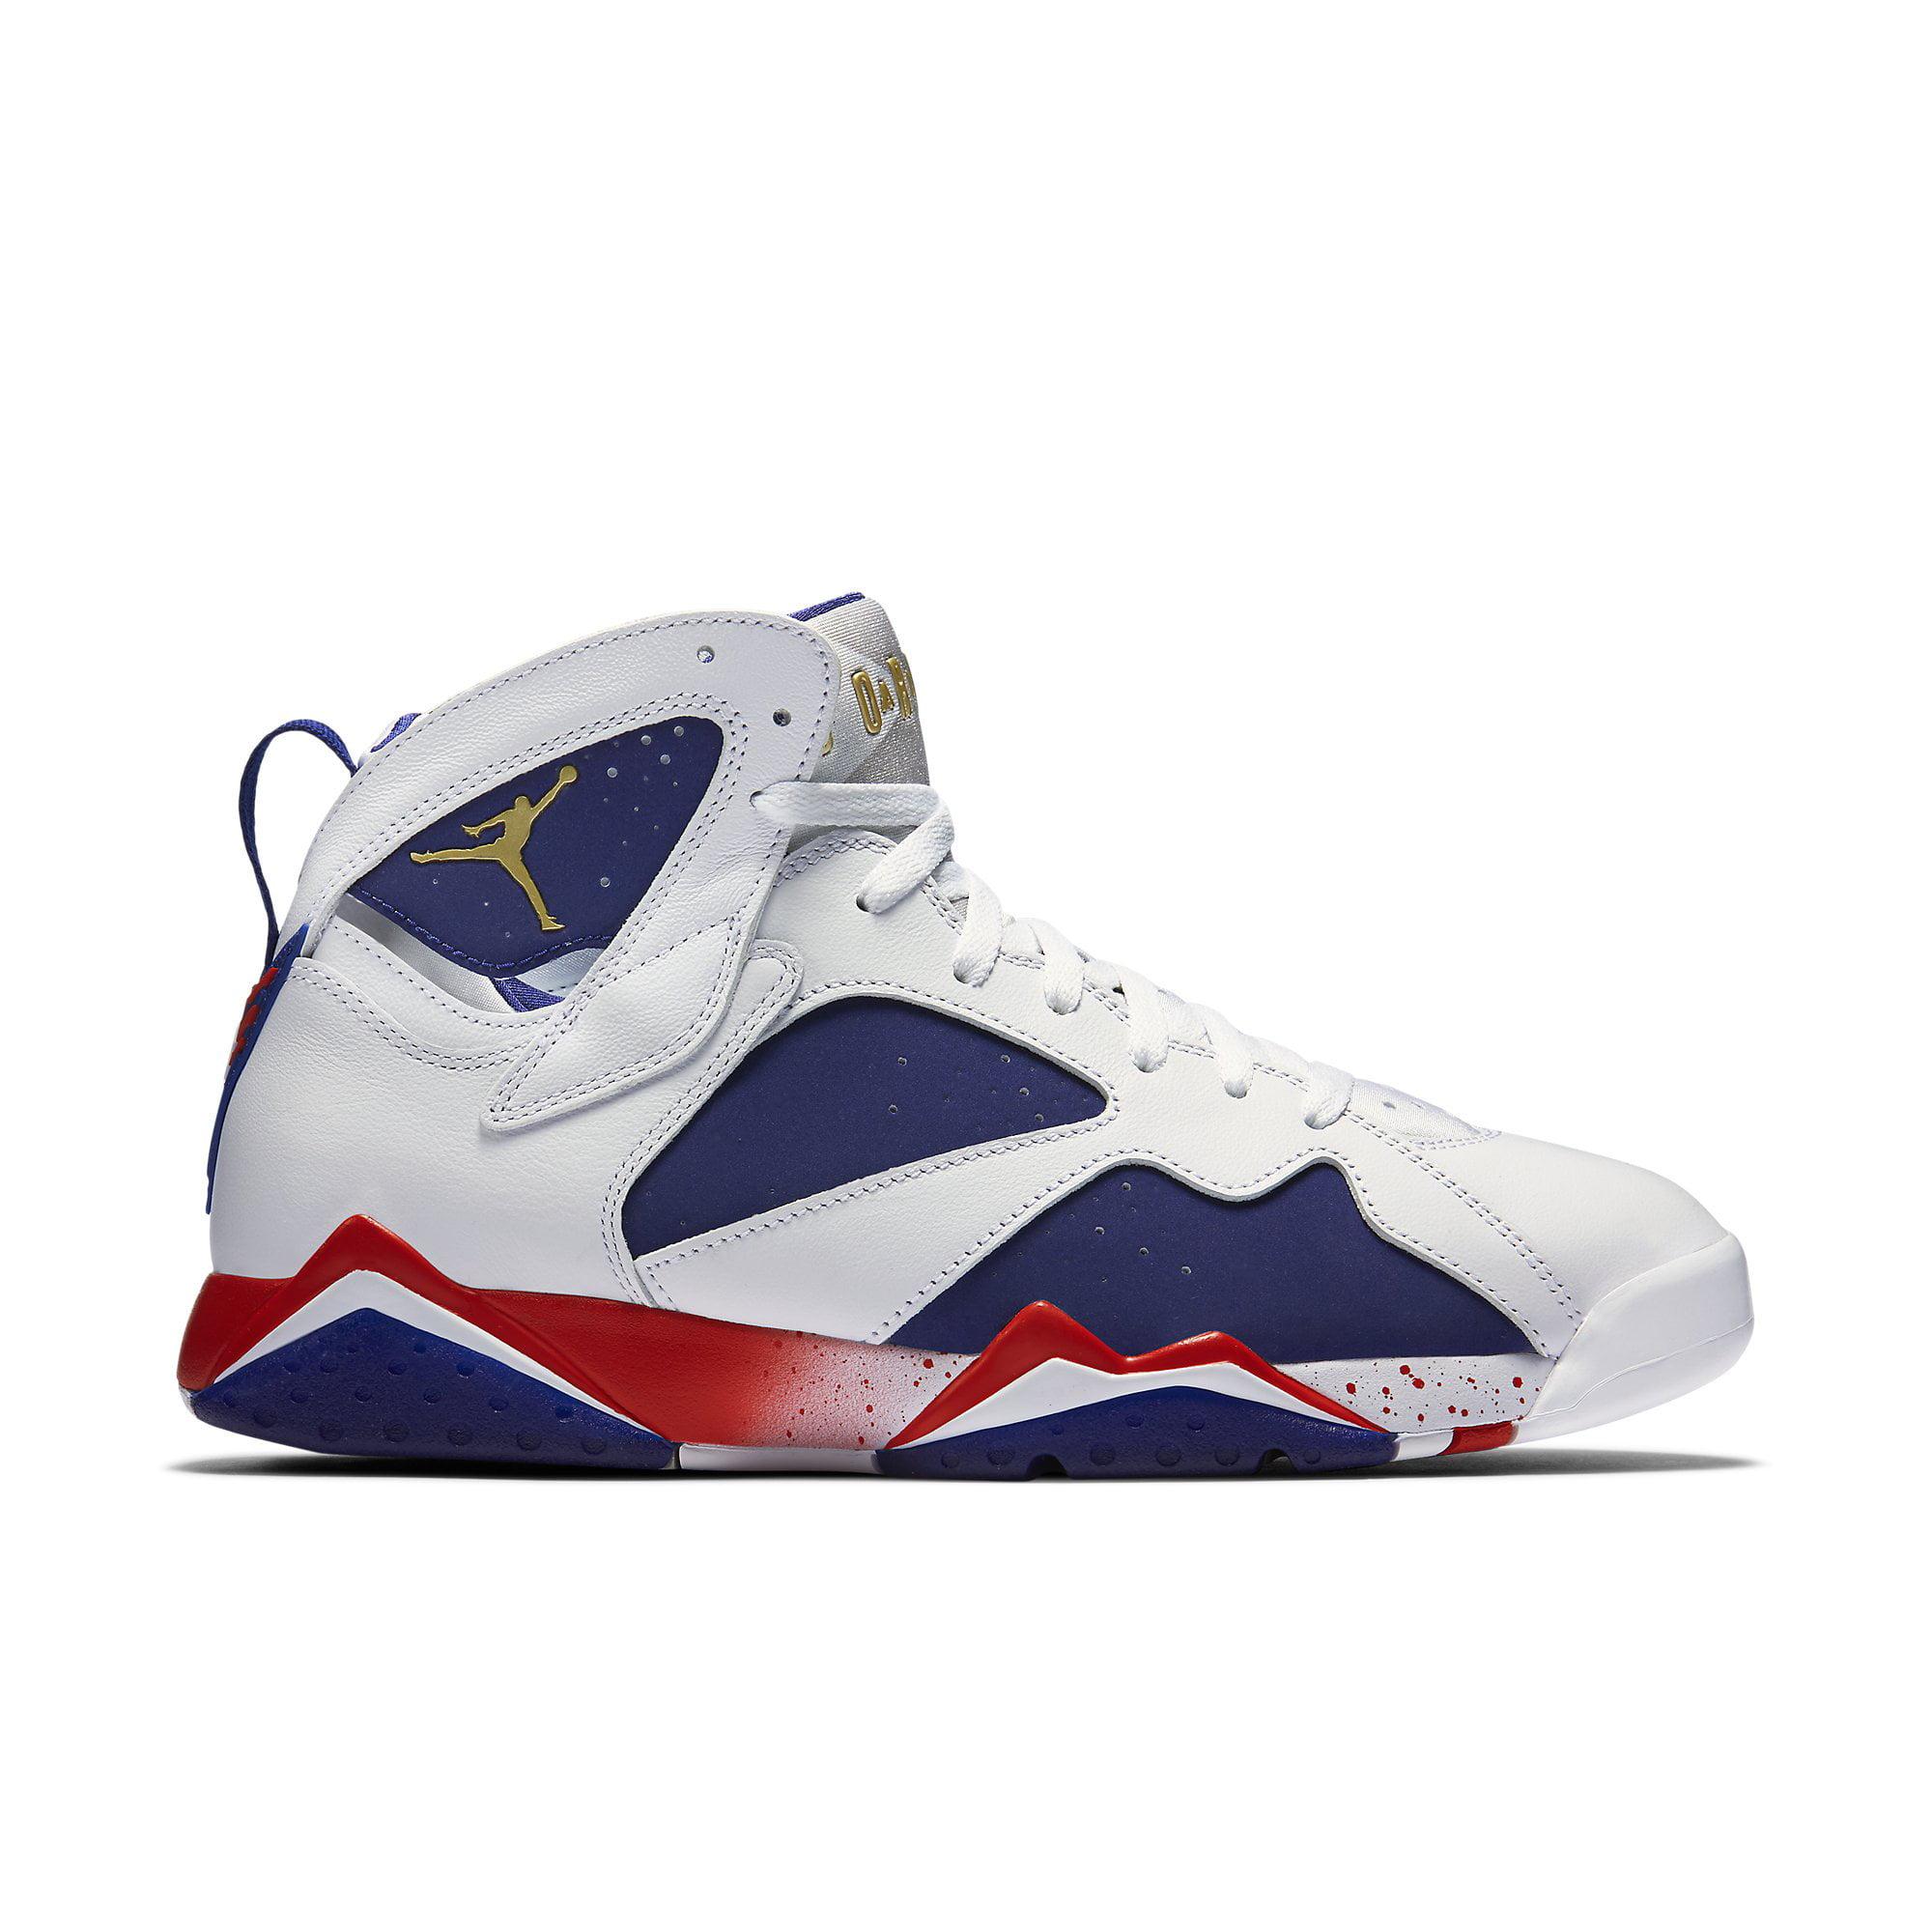 7e784dc644ccc7 ... authentic air jordan 7 retro olympic tinker alternate mens shoes white  deep royal blue fire red